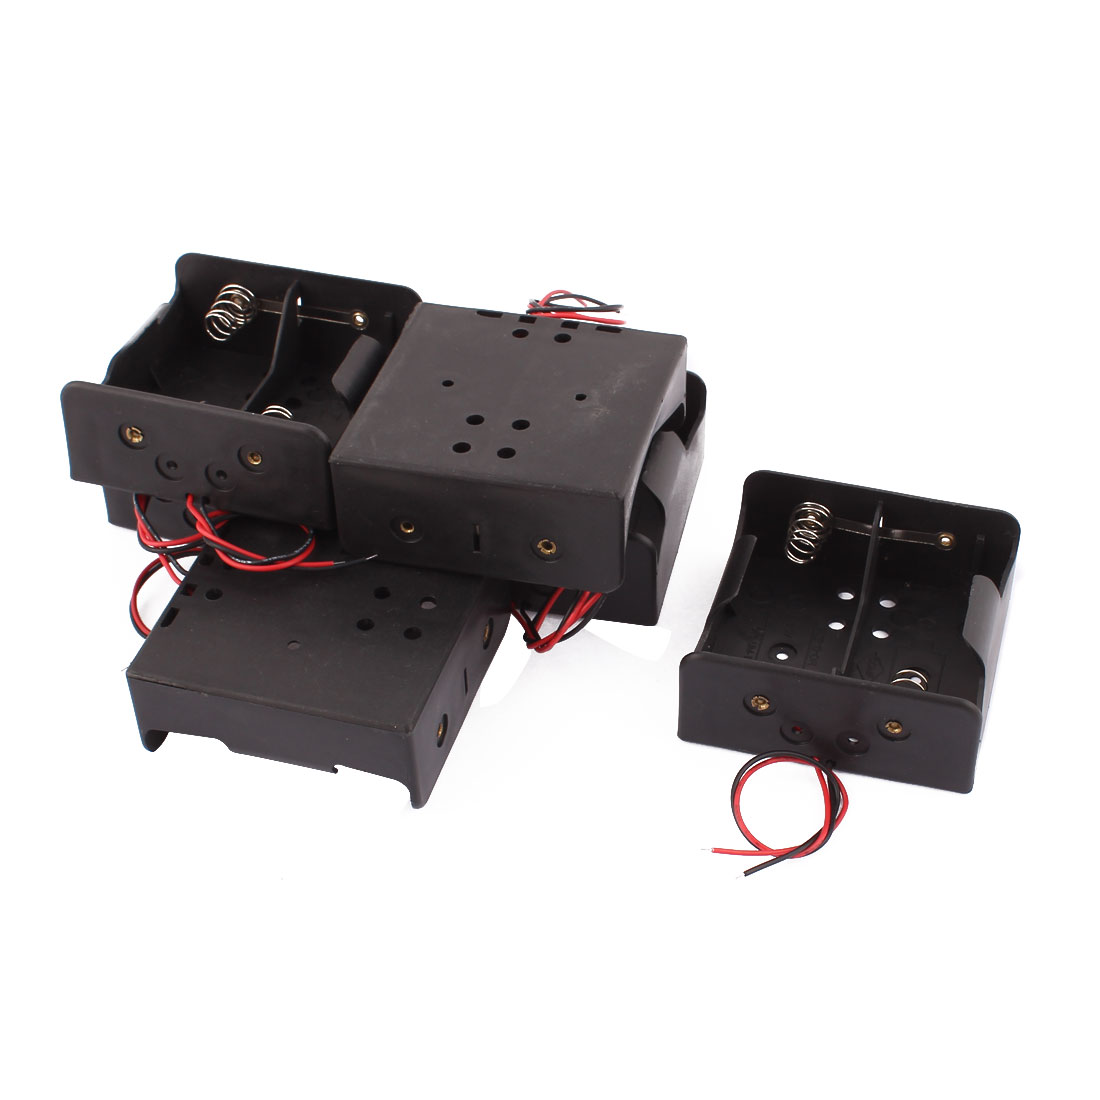 2 x 1.5V Type D 2 Pin Black Plastic Battery Cell Case Leads 6 Pcs